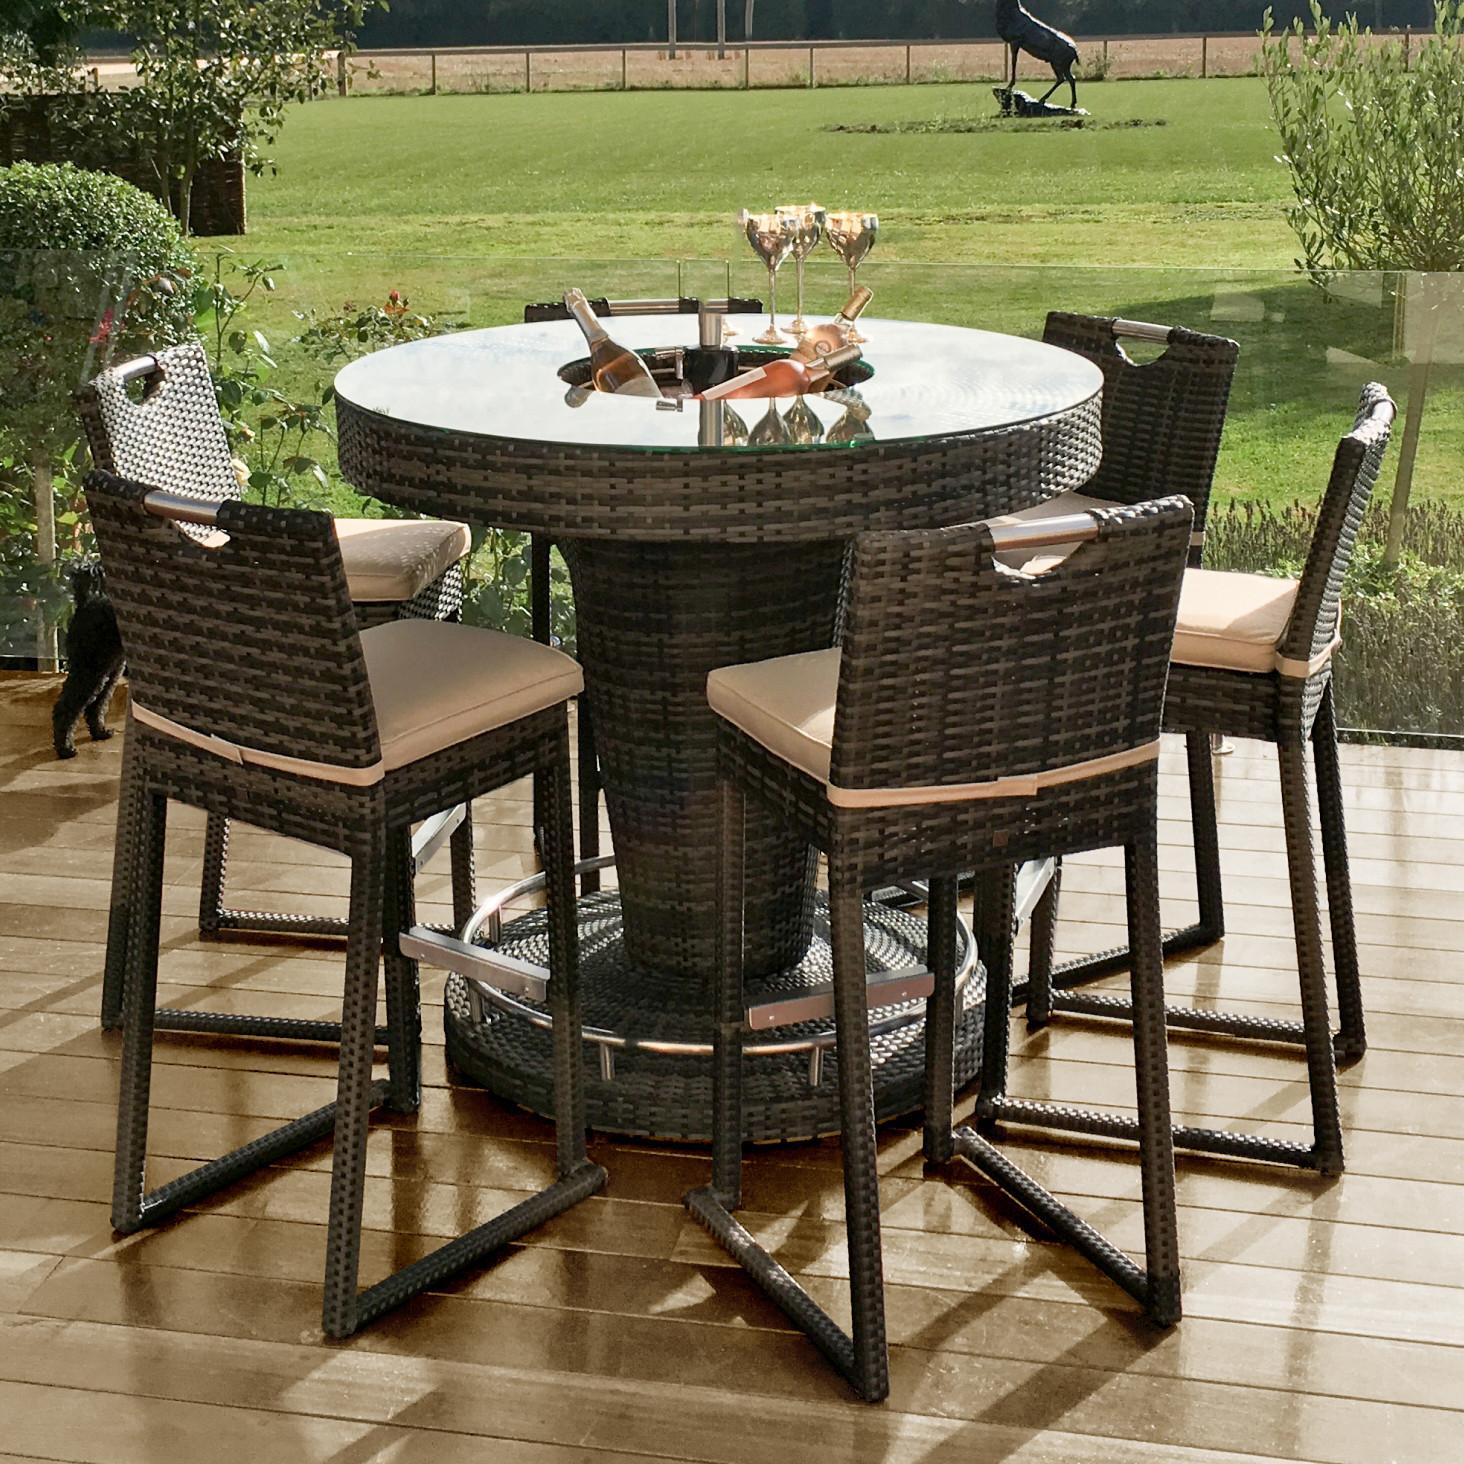 Brown Flat Weave 6 Seat Bar Set With Ice Bucket Furniture Northampton Simply Furniture